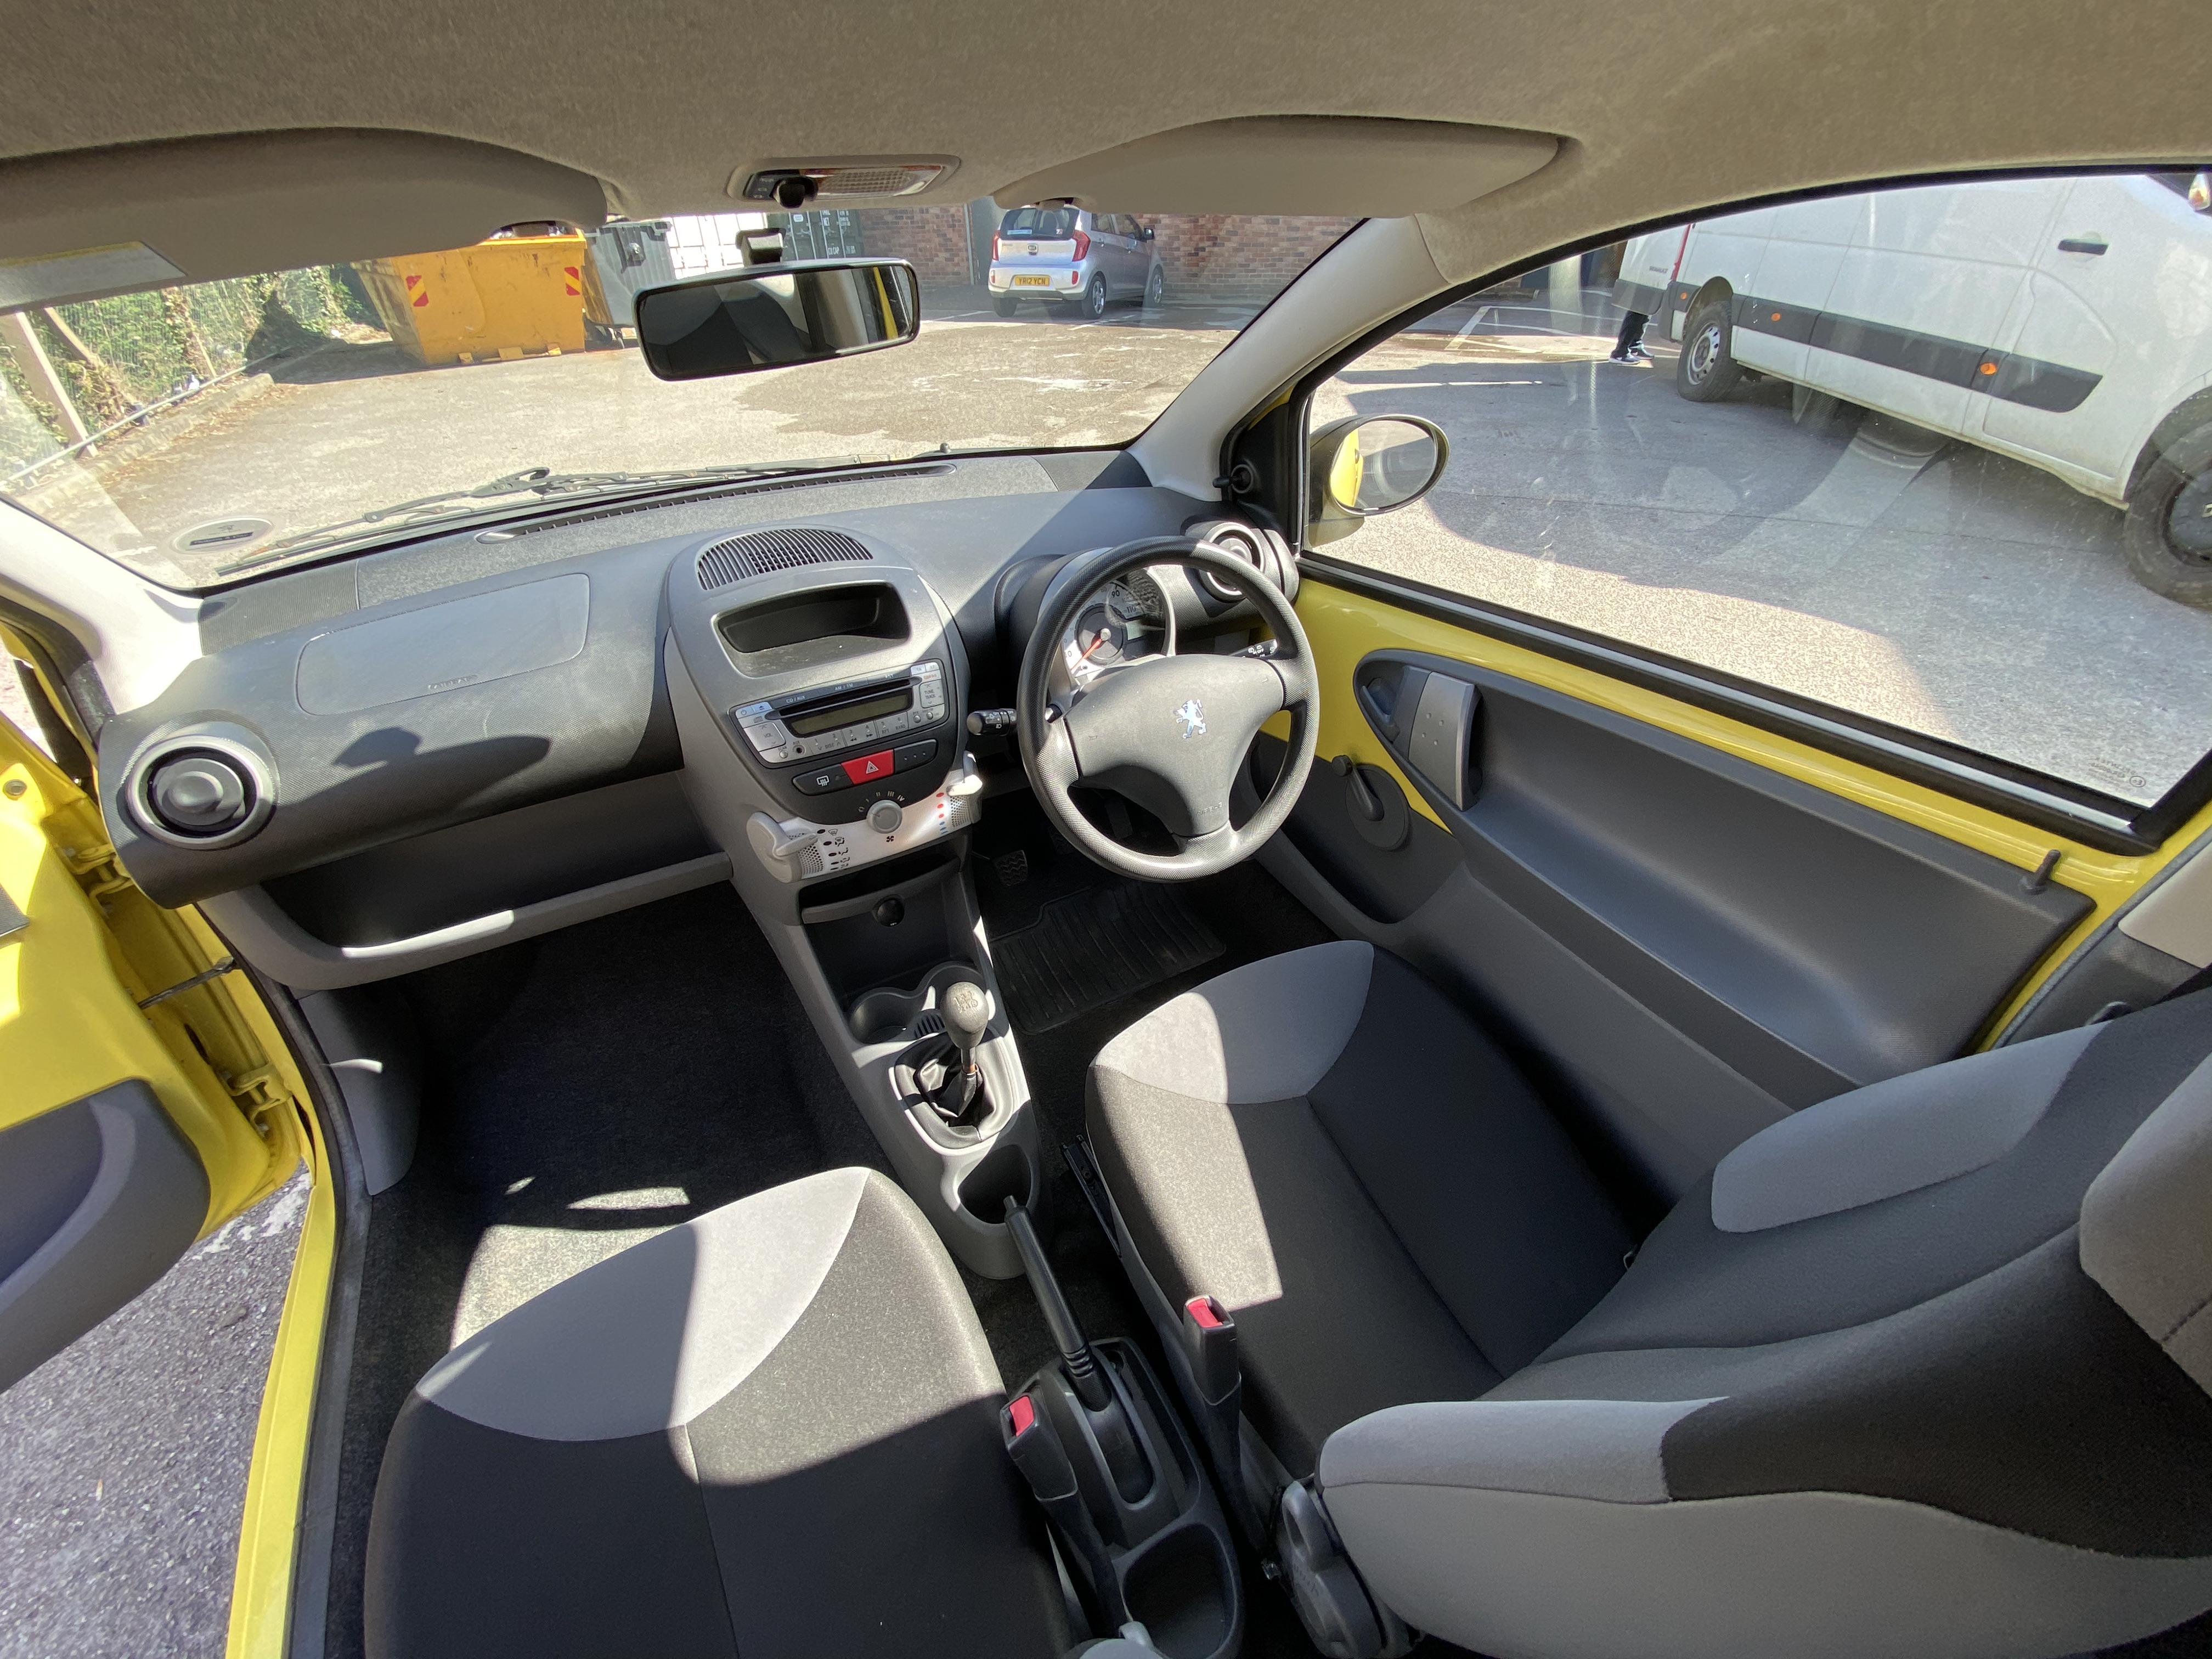 [MA61 KPU] 2011 Peugeot 107 1.0 Urban Lite 3-door hatchback in Yellow, 9,167 Miles, MOT expired - Image 3 of 7